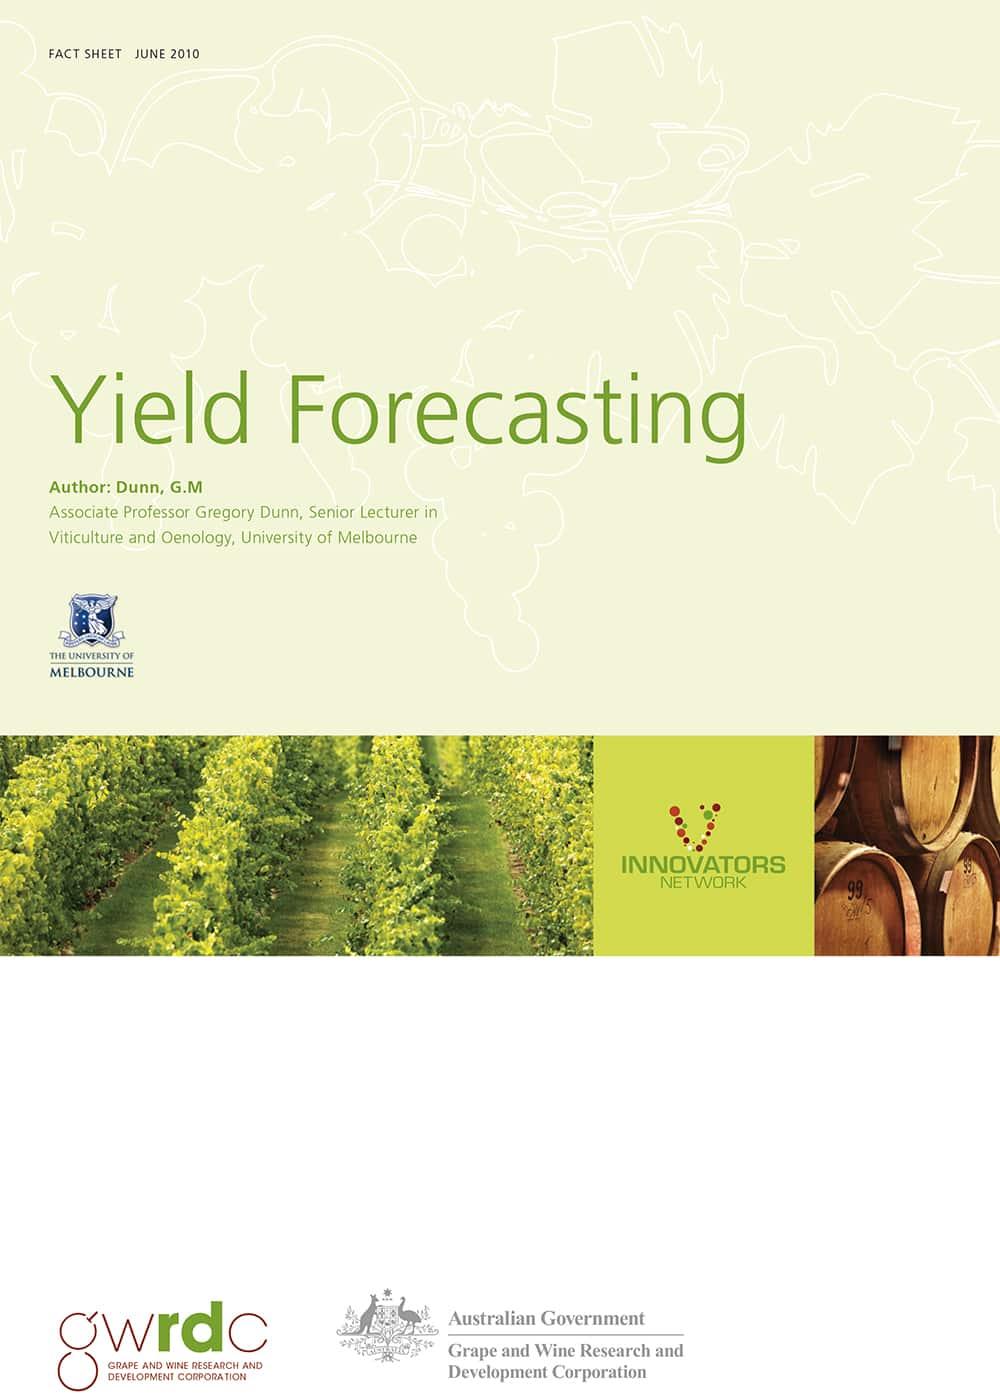 Yield Forecasting